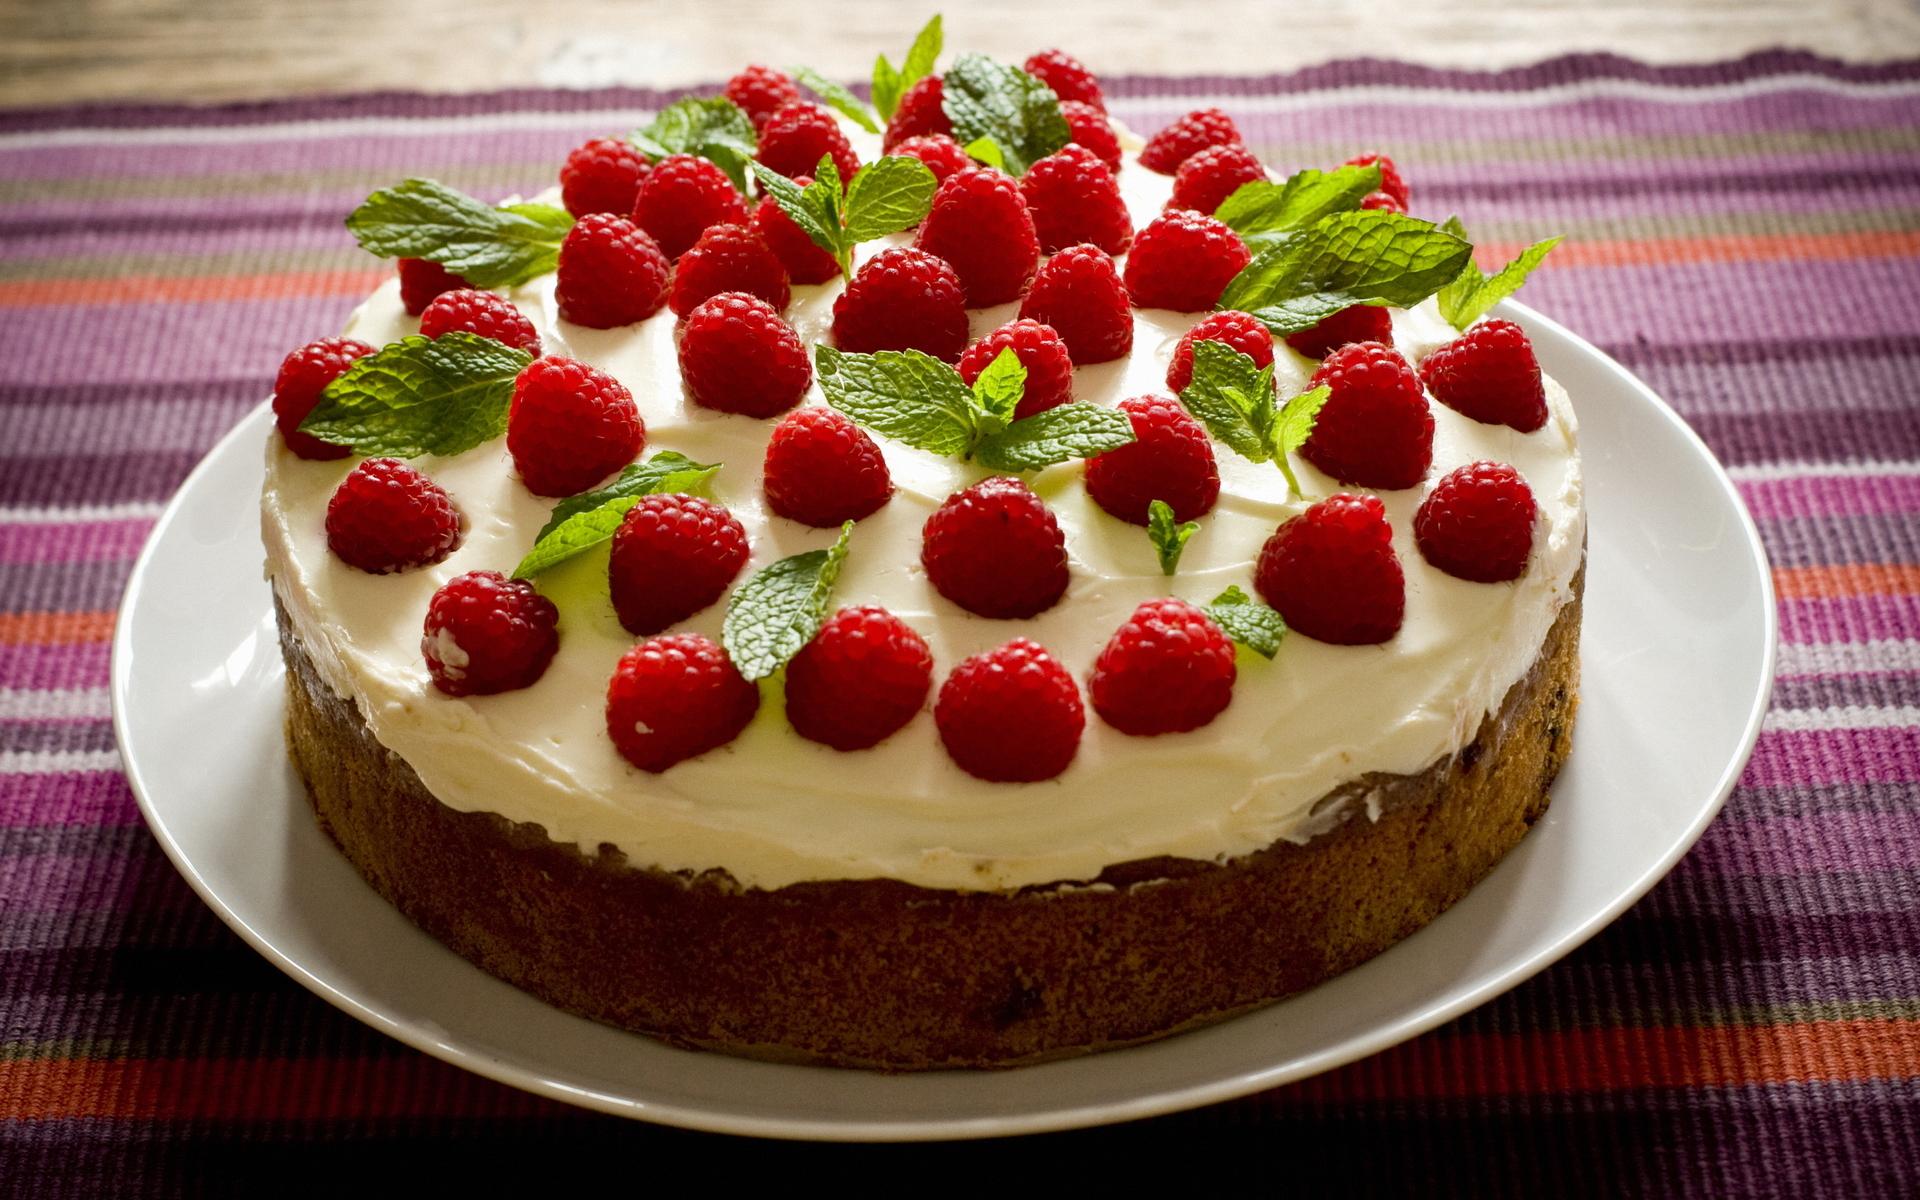 http://on-desktop.com/wps/Food_Cakes_and_Sweet_Cake_with_raspberries_031169_.jpg